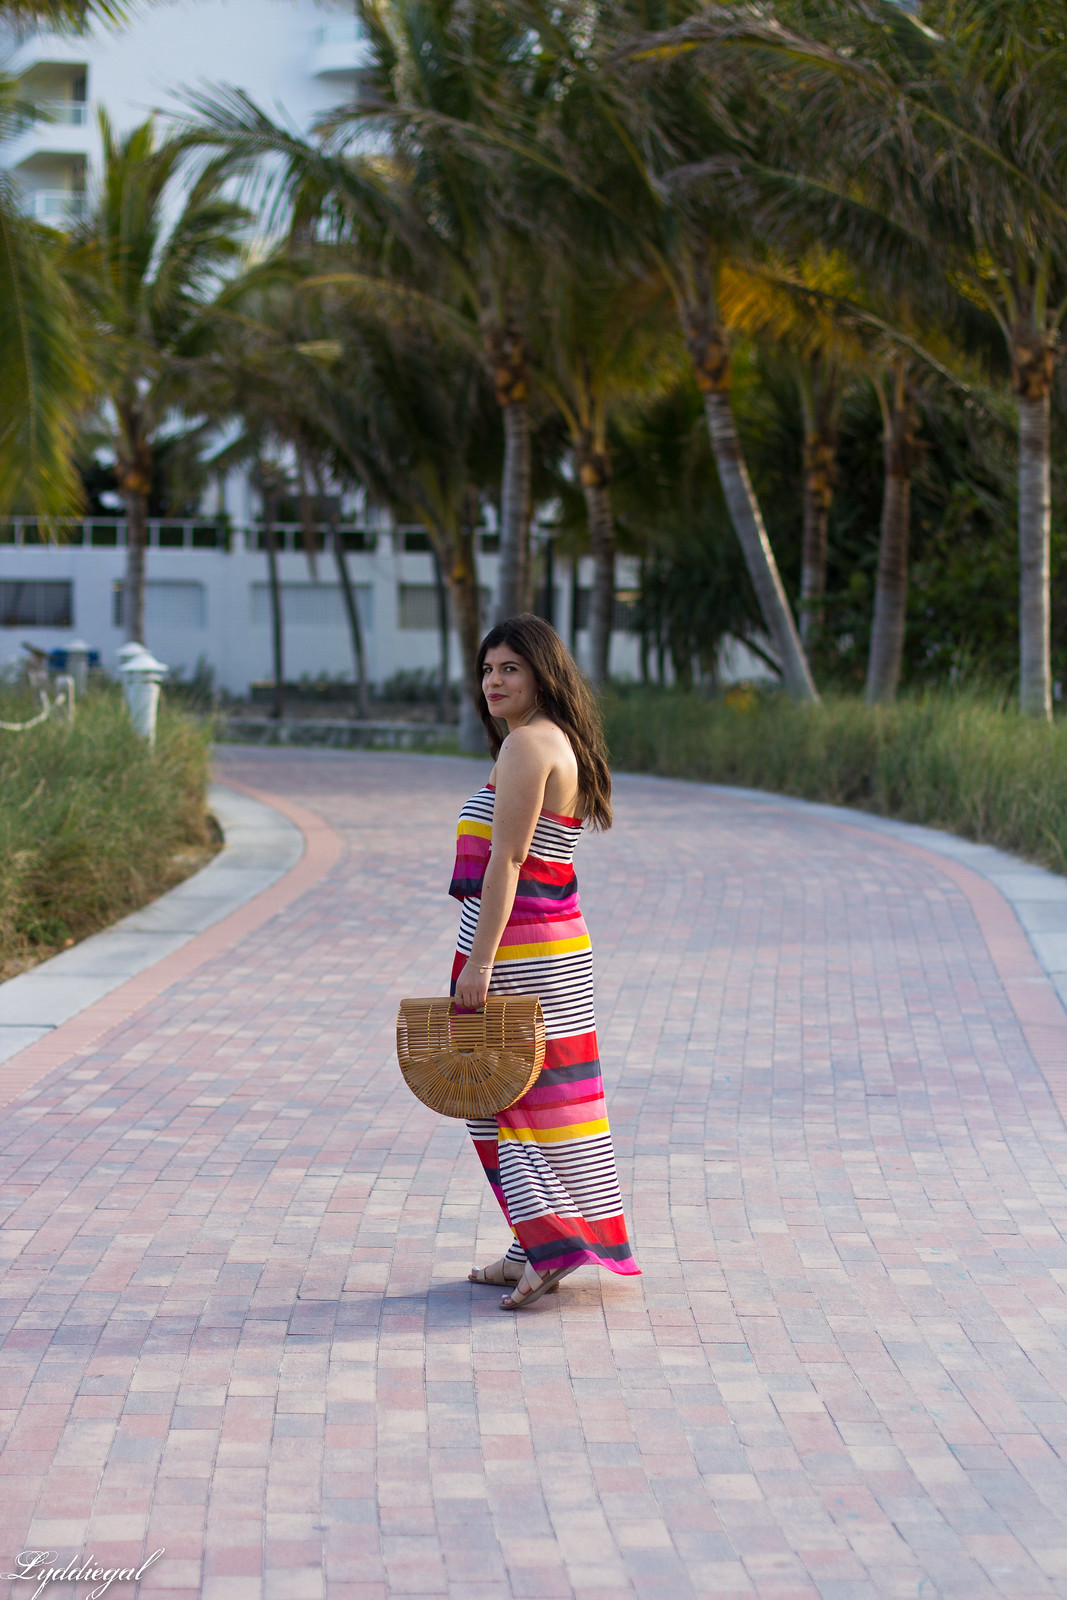 pink striped maxi dress, bamboo half moon bag, beach outfit-3.jpg